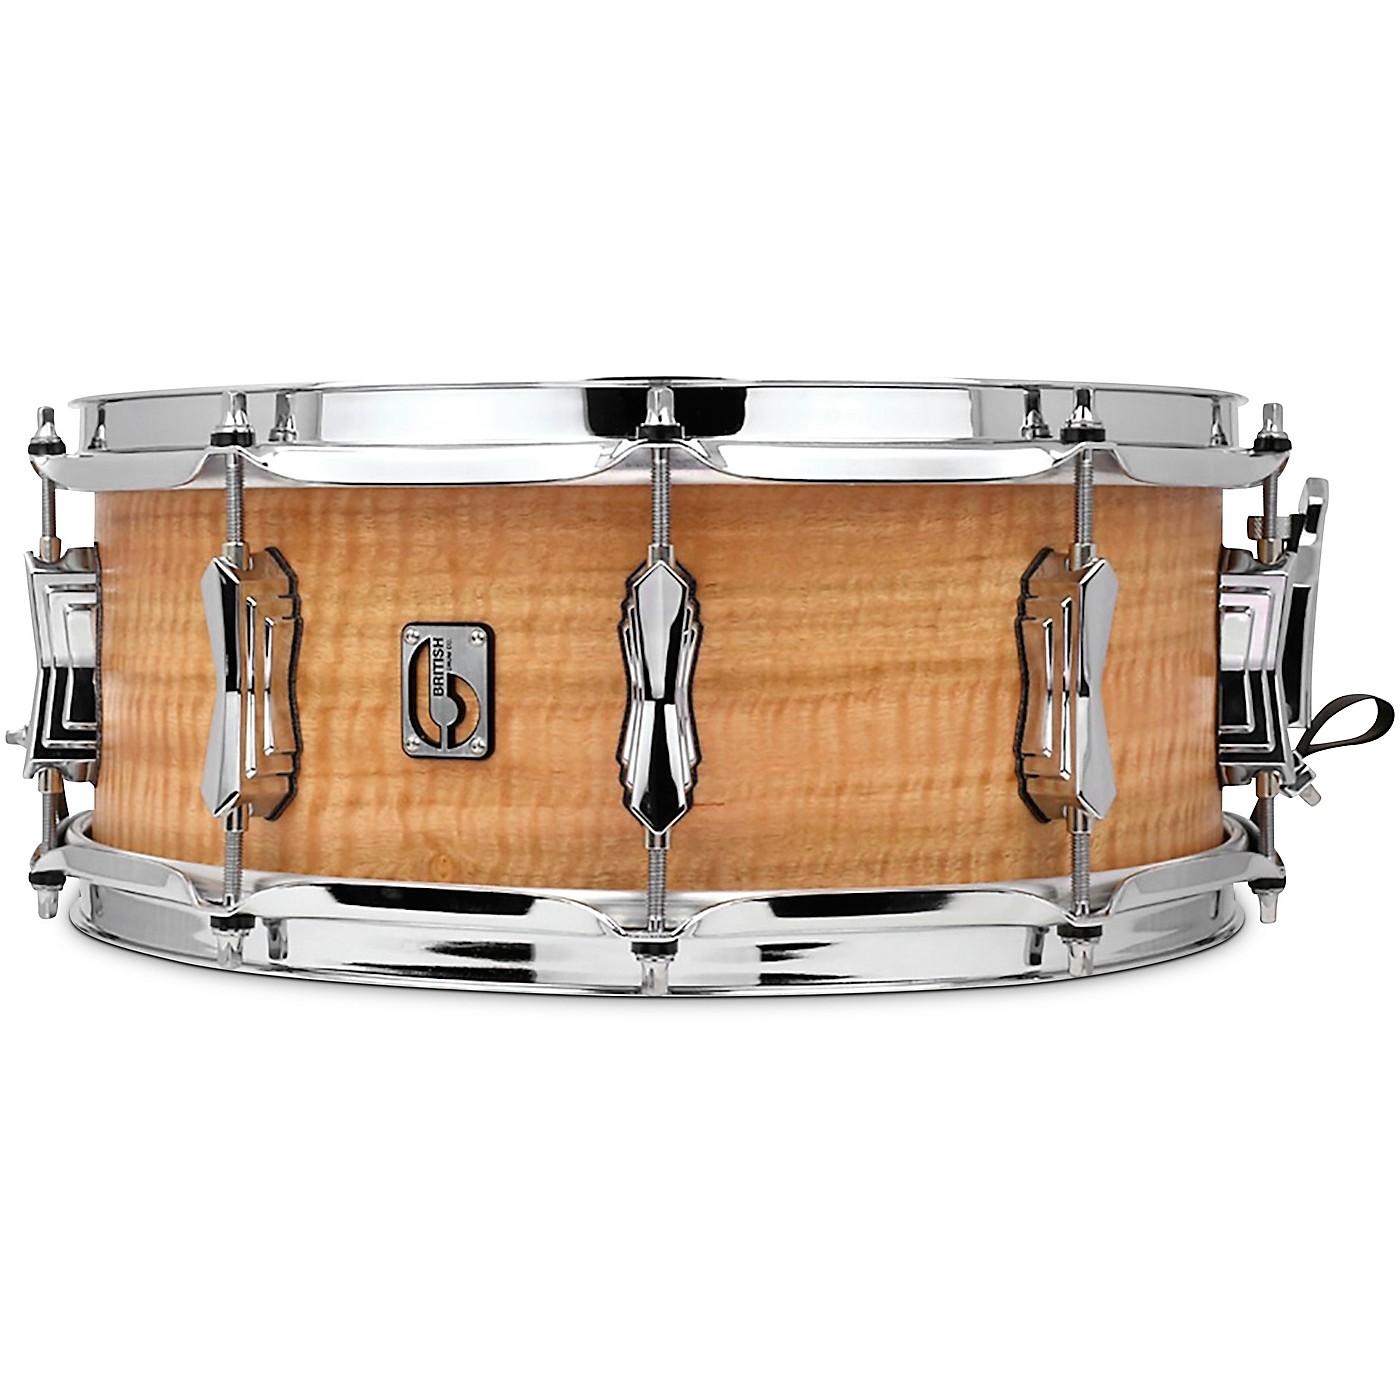 British Drum Co. The Maverick Maple Snare Drum thumbnail